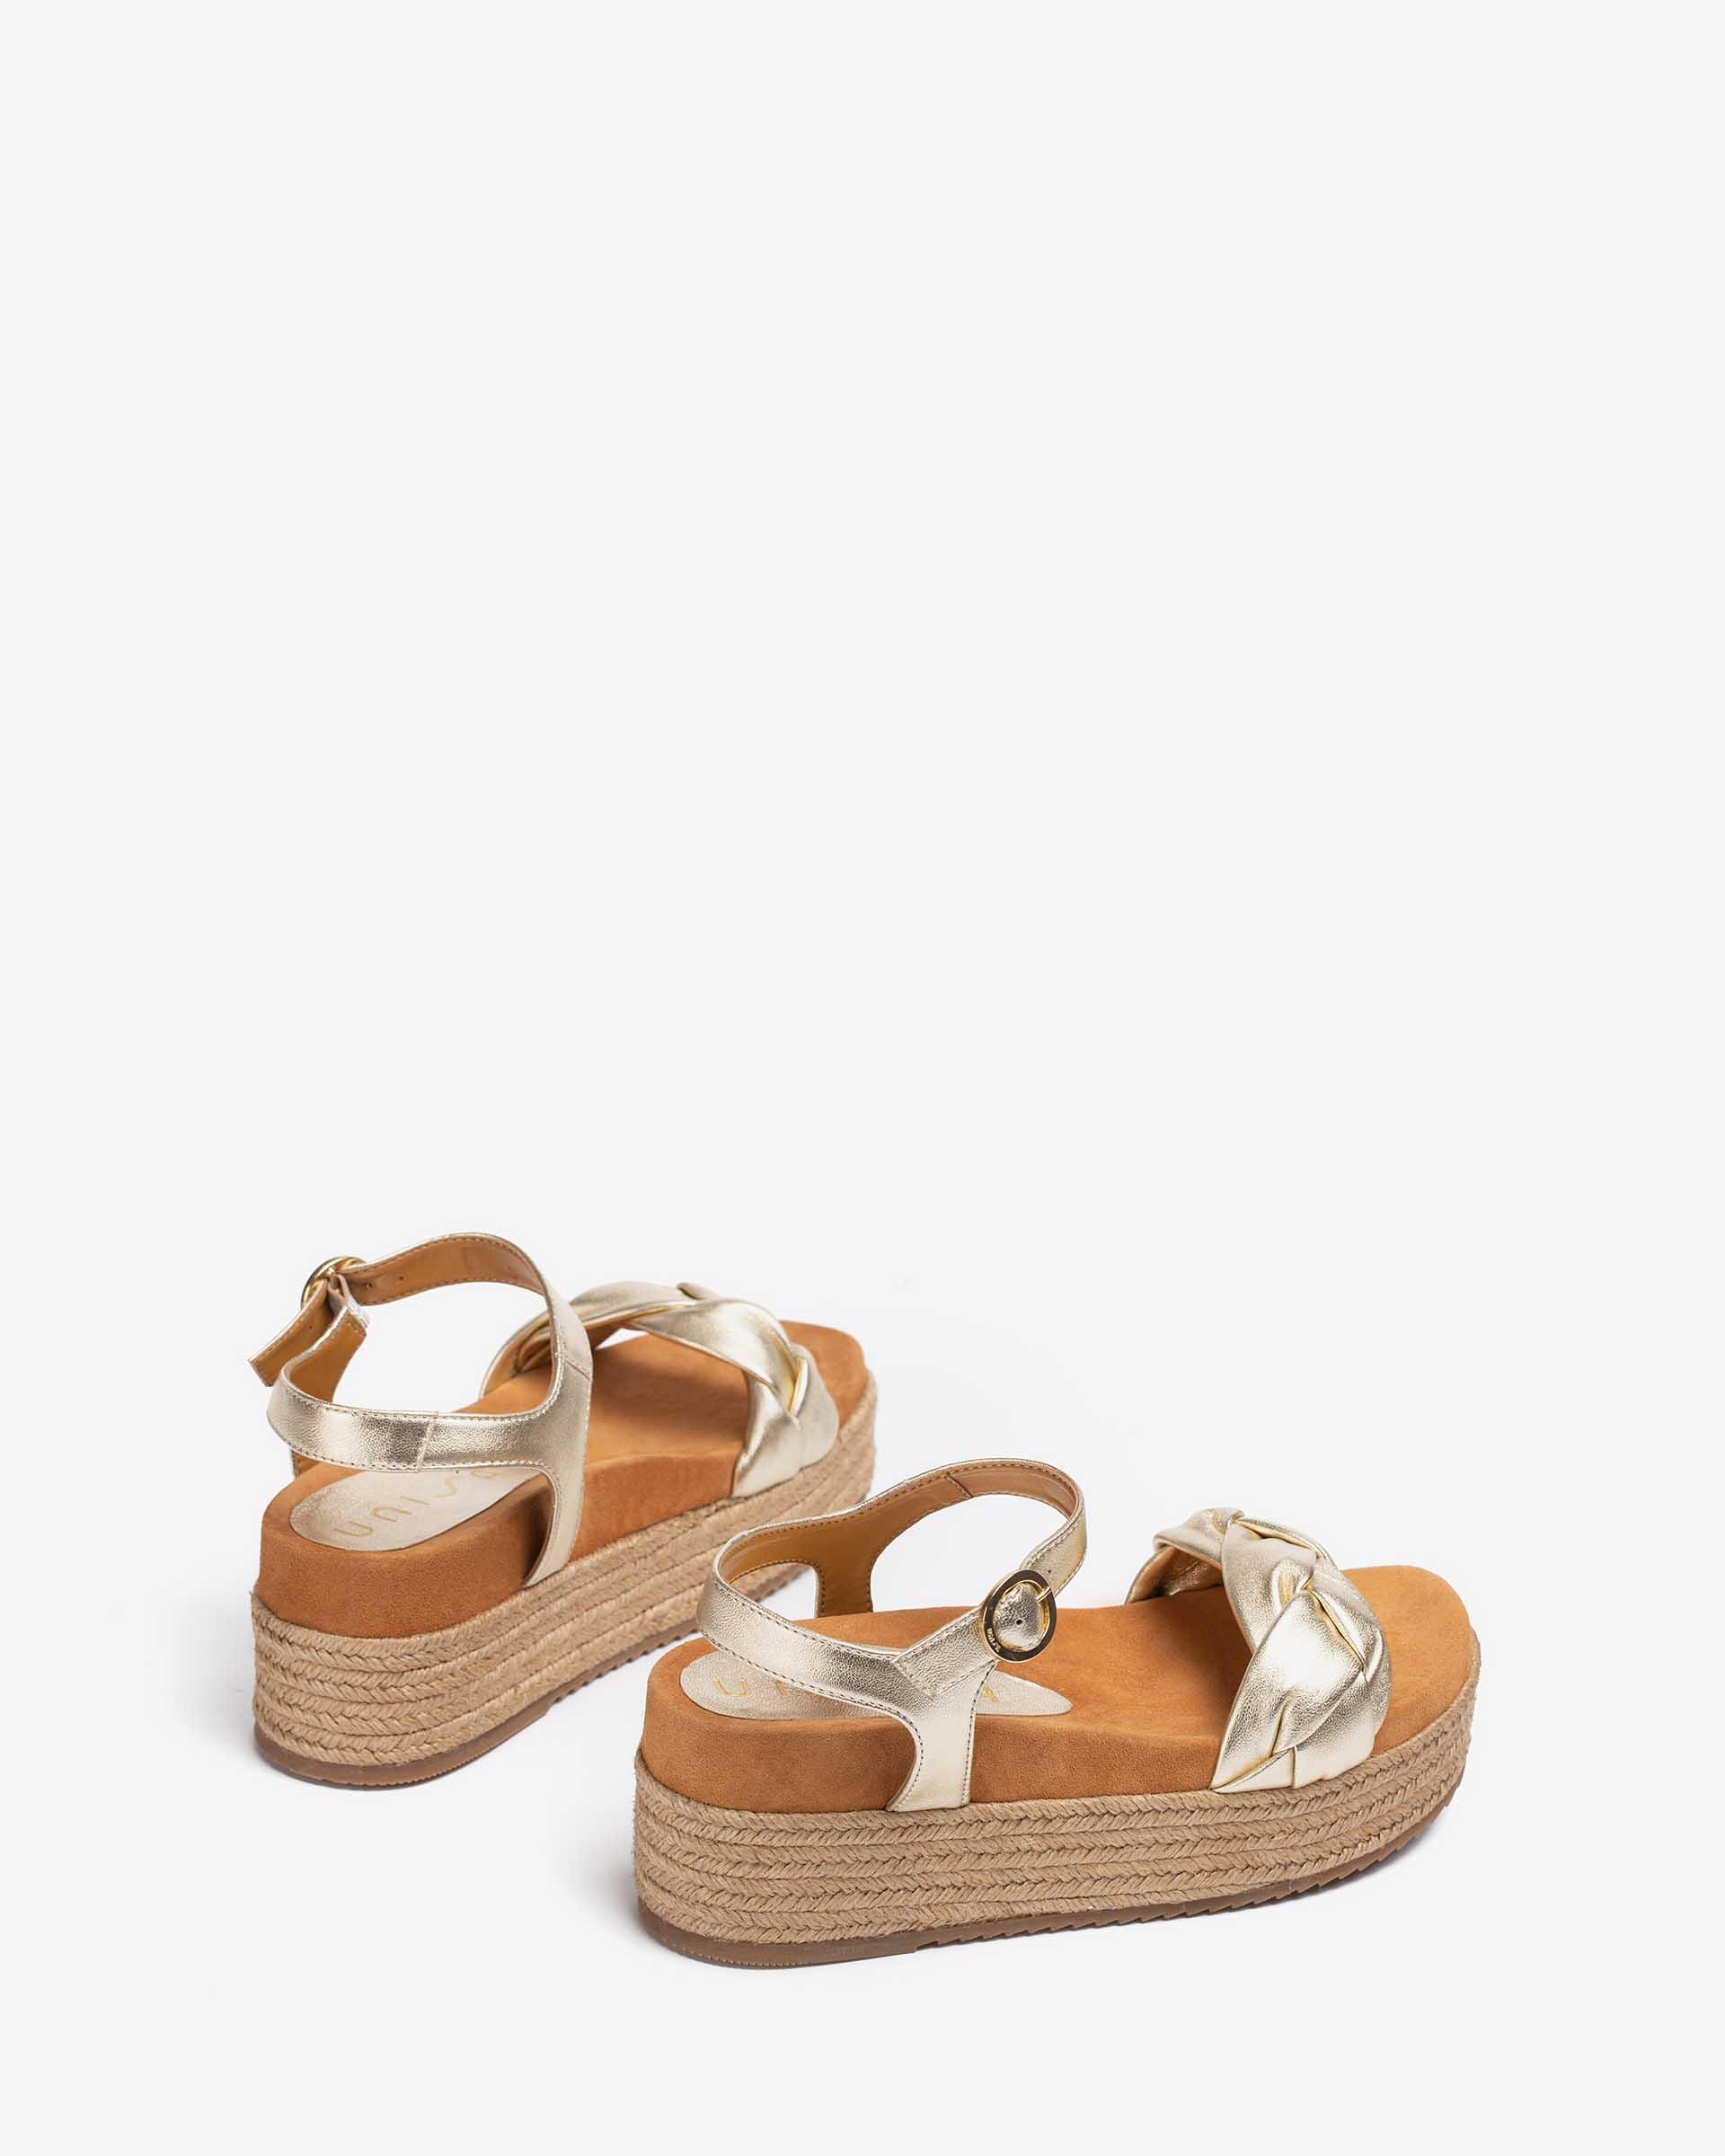 UNISA Shiny platform padded sandals CLOY_LMT 2